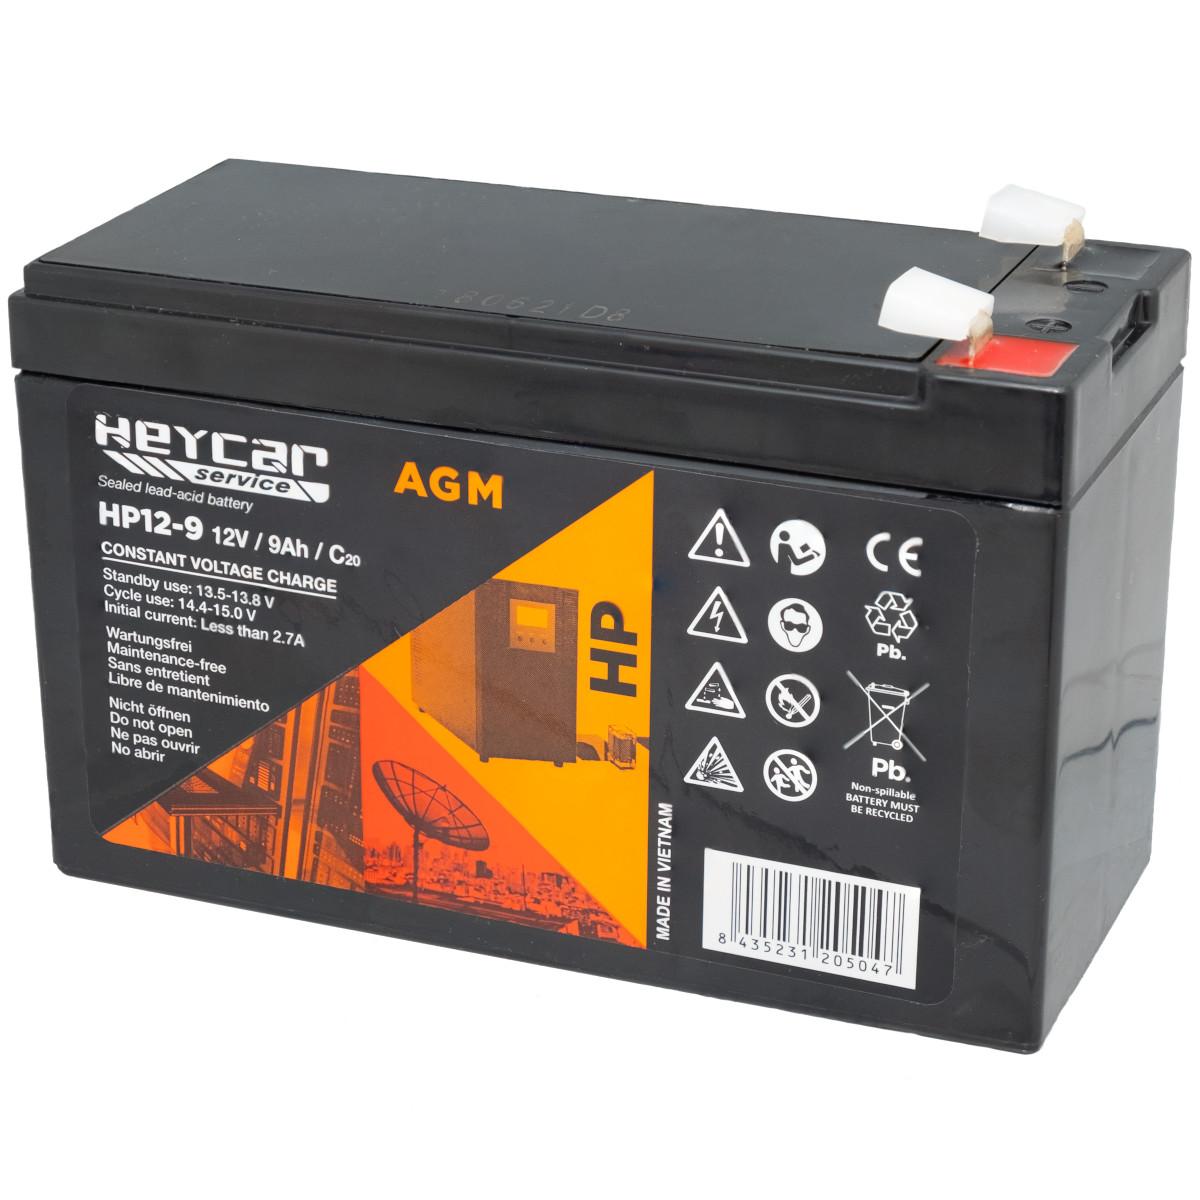 Batería 12V 9Ah HeyCar serie HP 151x65x93.5/100 (L x W x H)